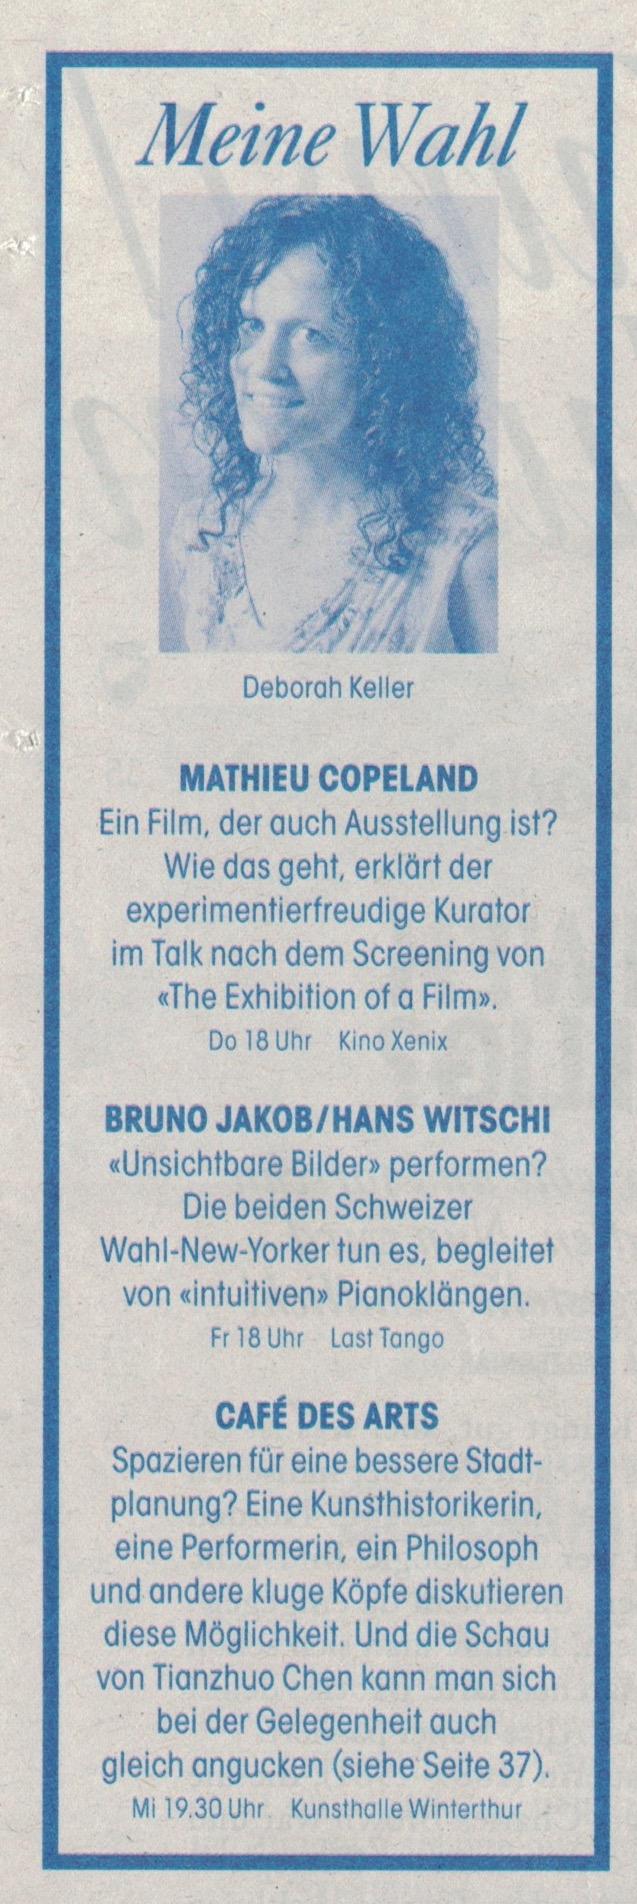 Tages Anzeiger, Züritipp, 21/09/17 by Deborah Keller -